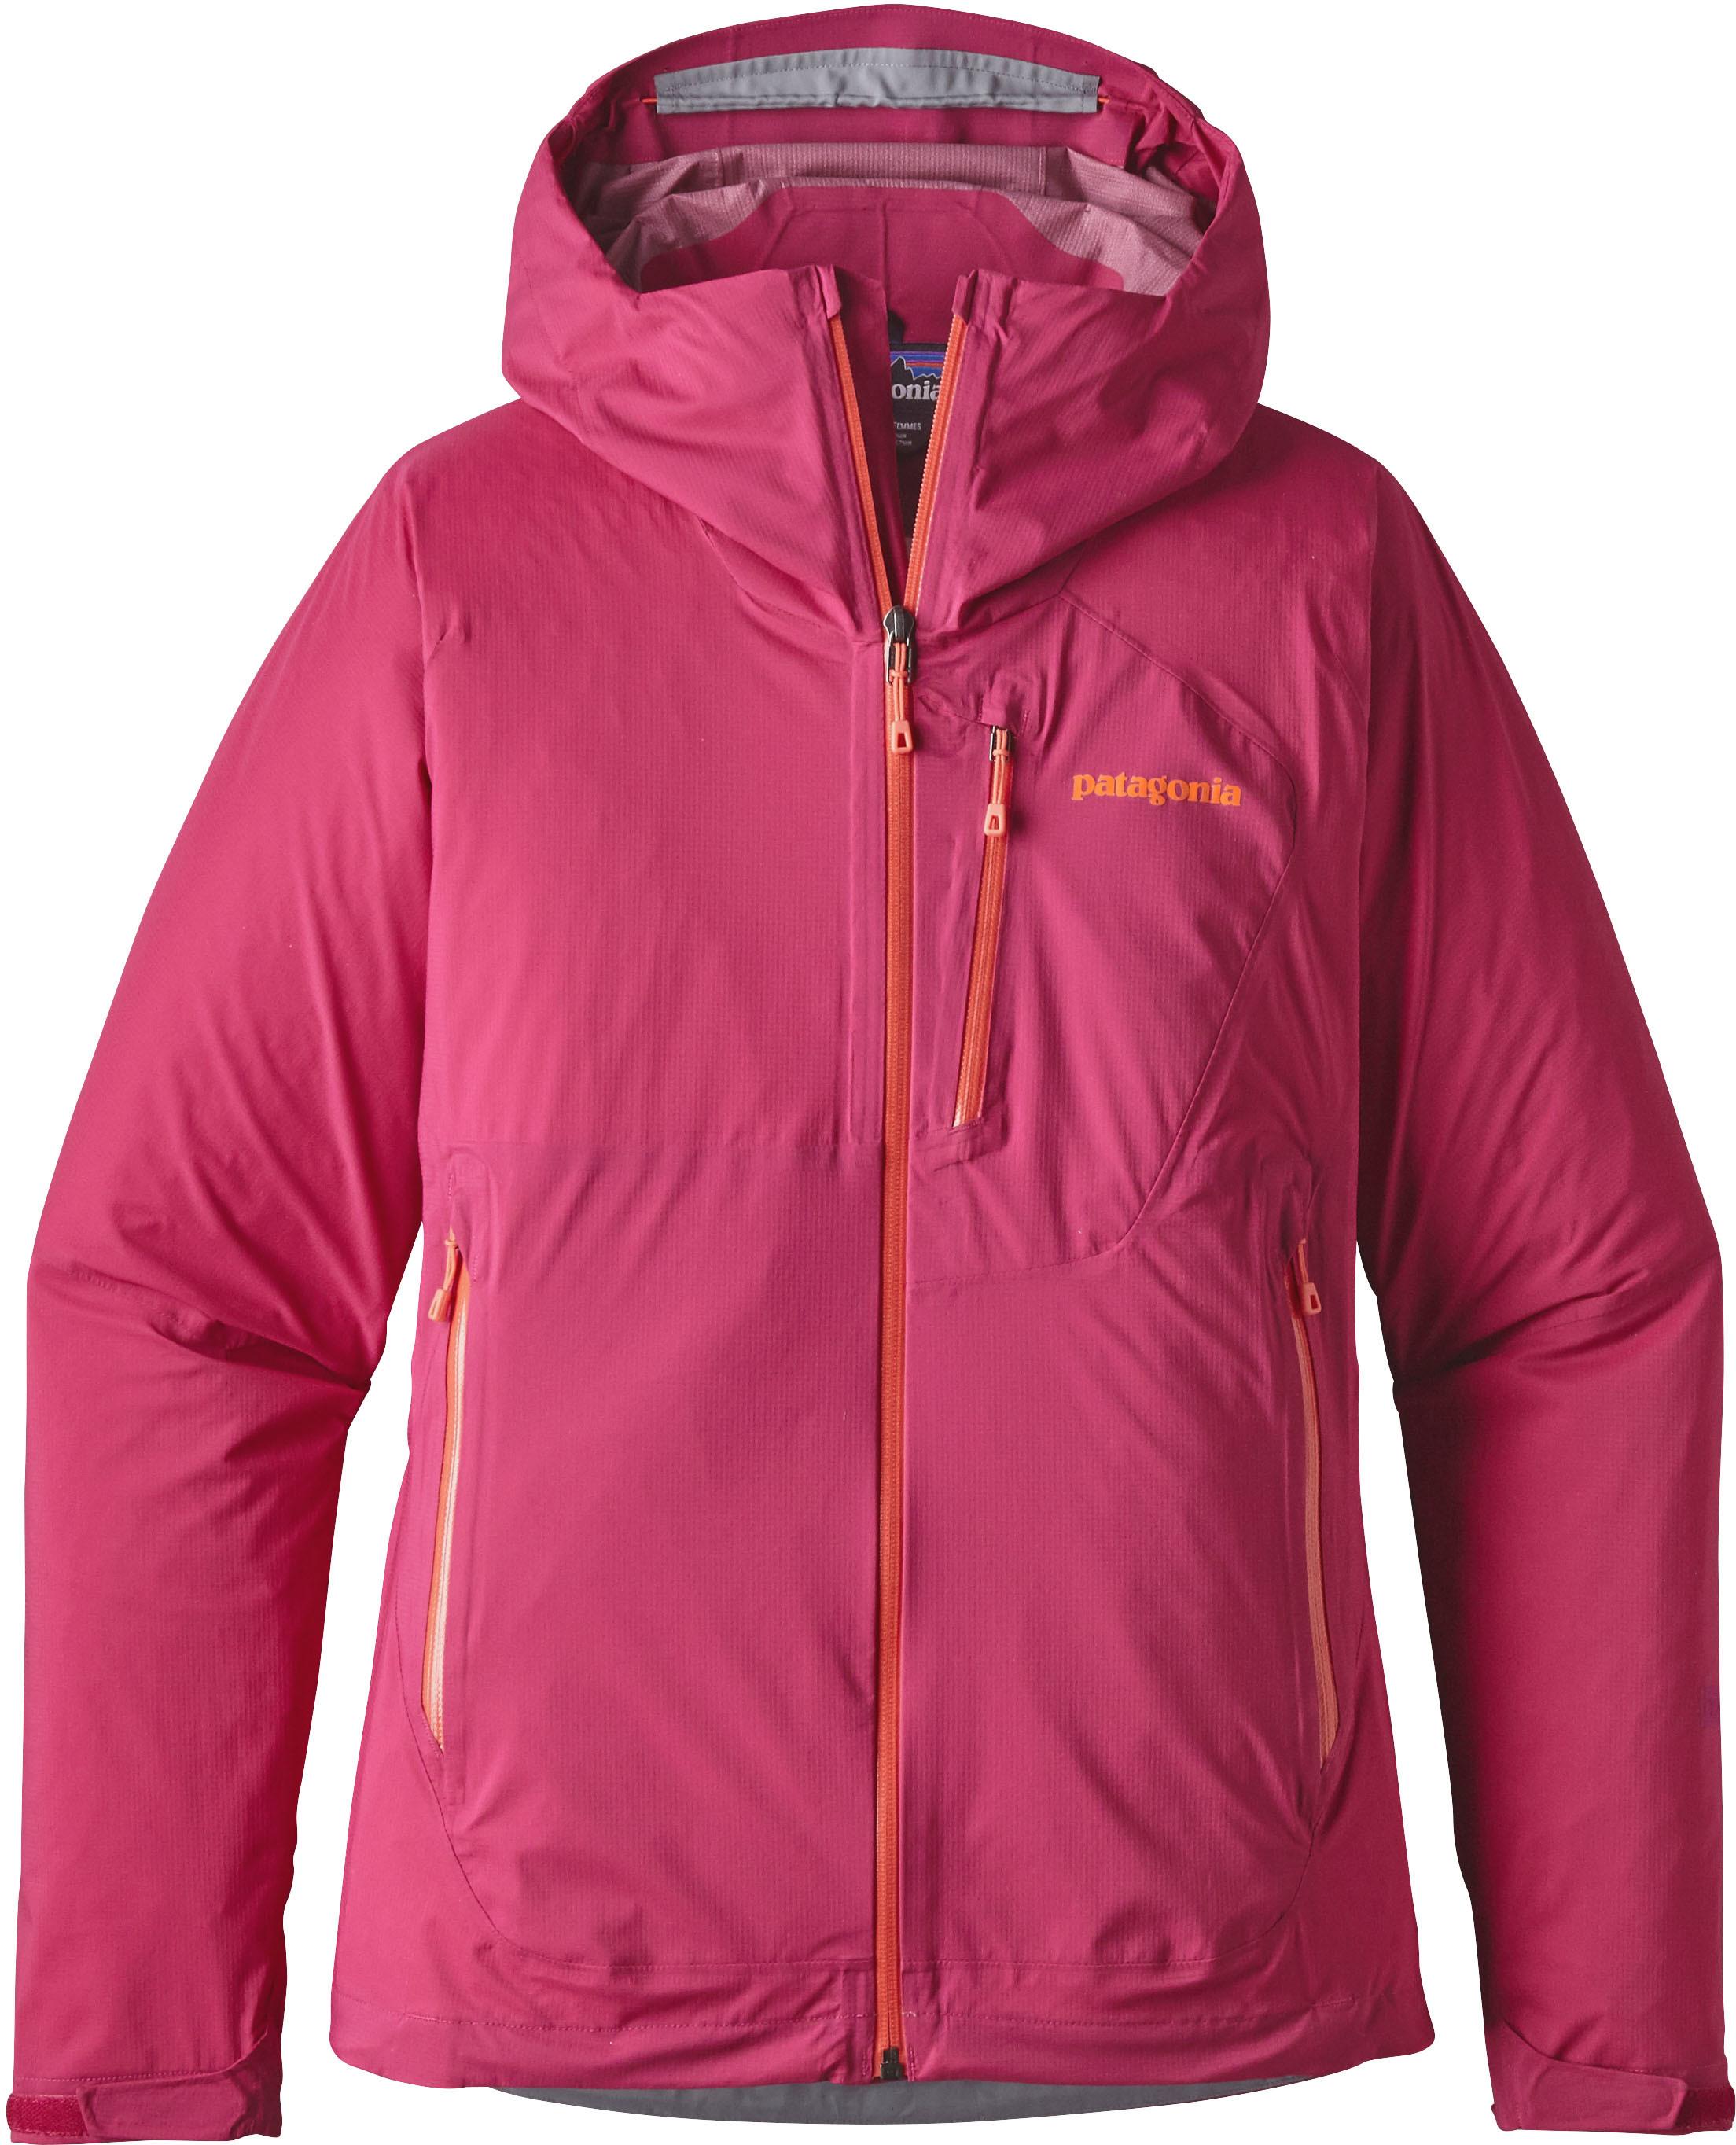 Patagonia Stretch Rainshadow Jacket - Womens — CampSaver 3da94821a